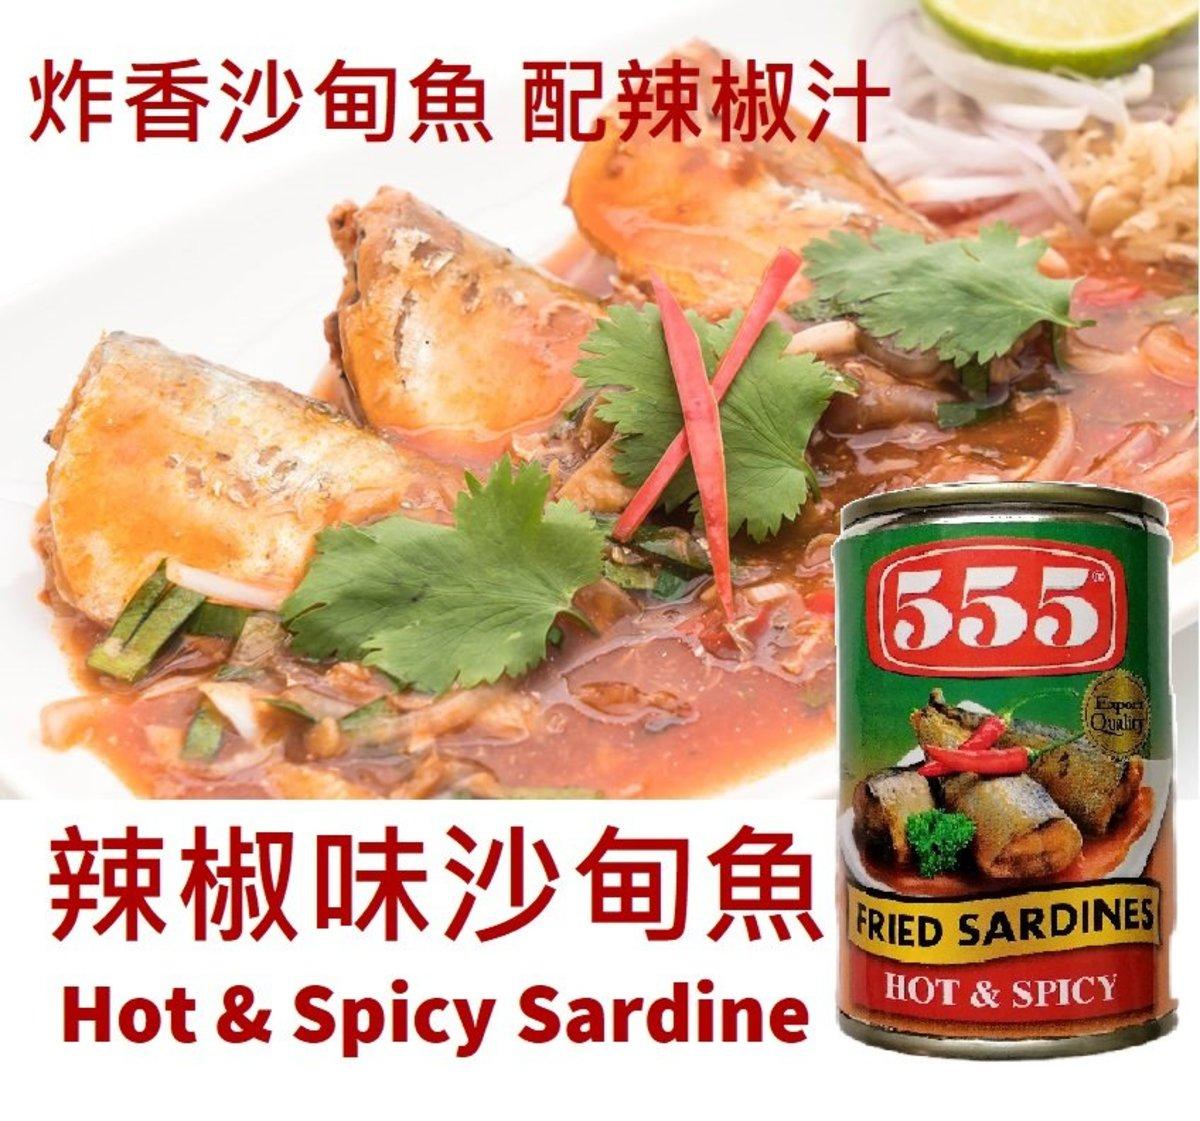 Hot & Spicy Fried Sardine Fish (155g)